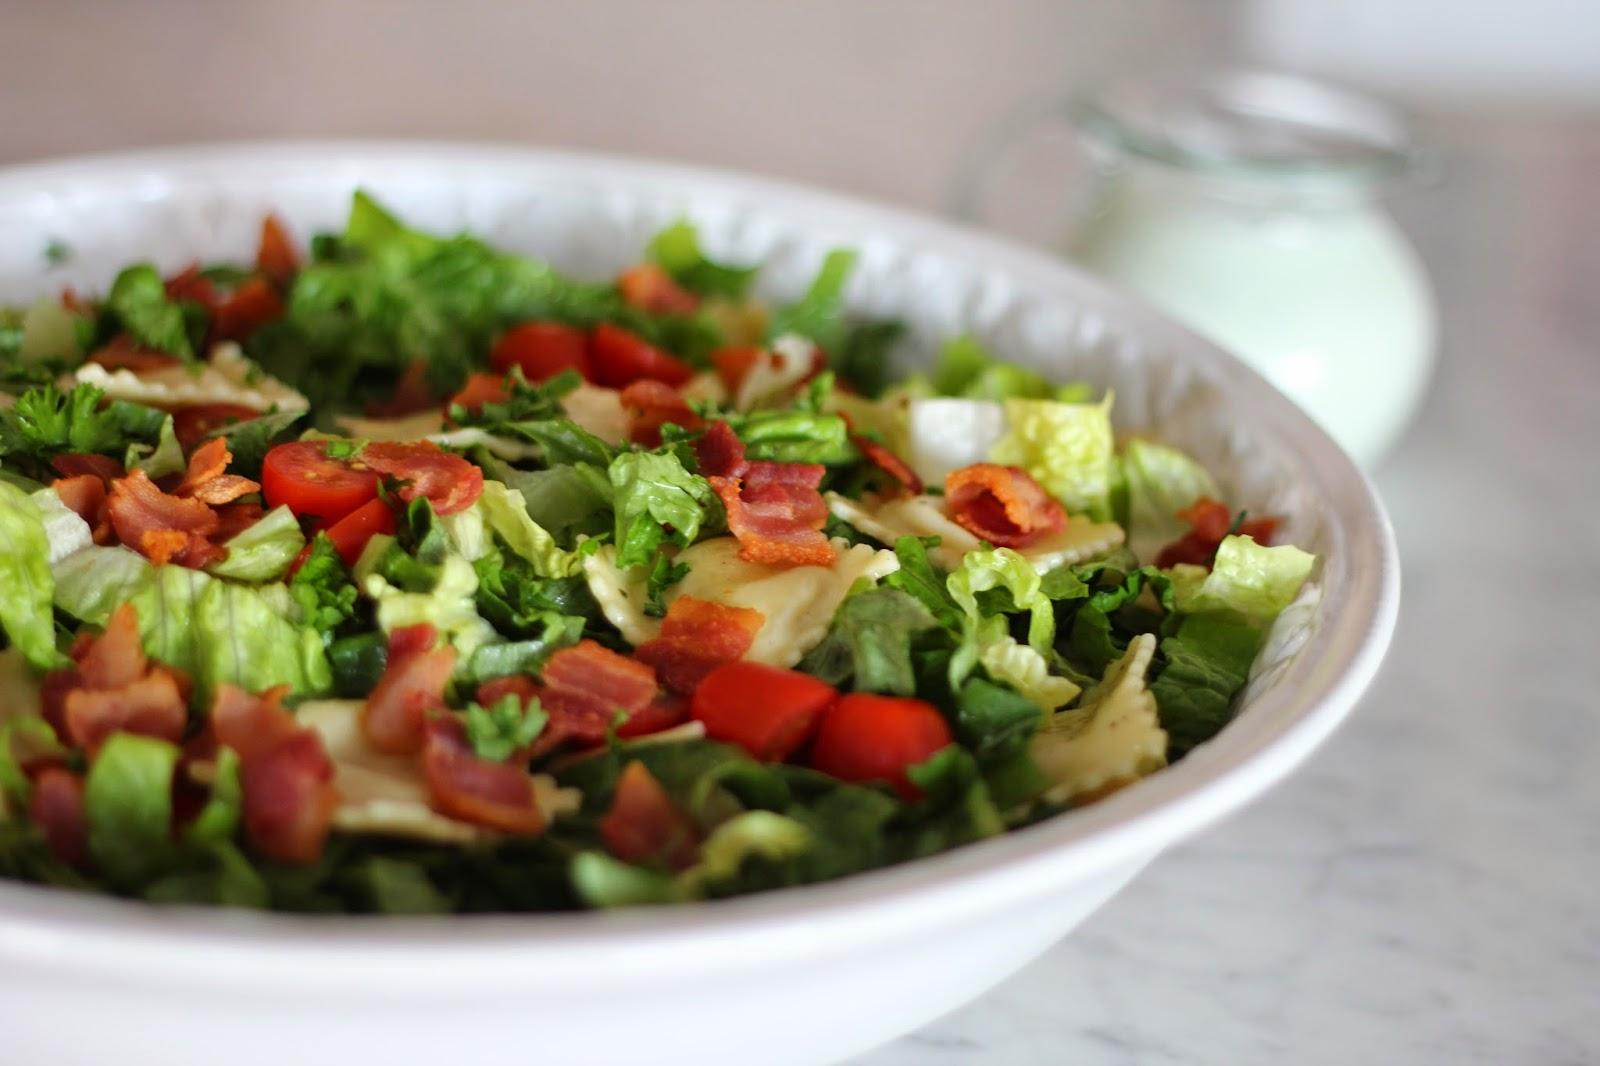 Bountiful Kitchen: BLT Pasta Salad with Buttermilk Ranch Dressing